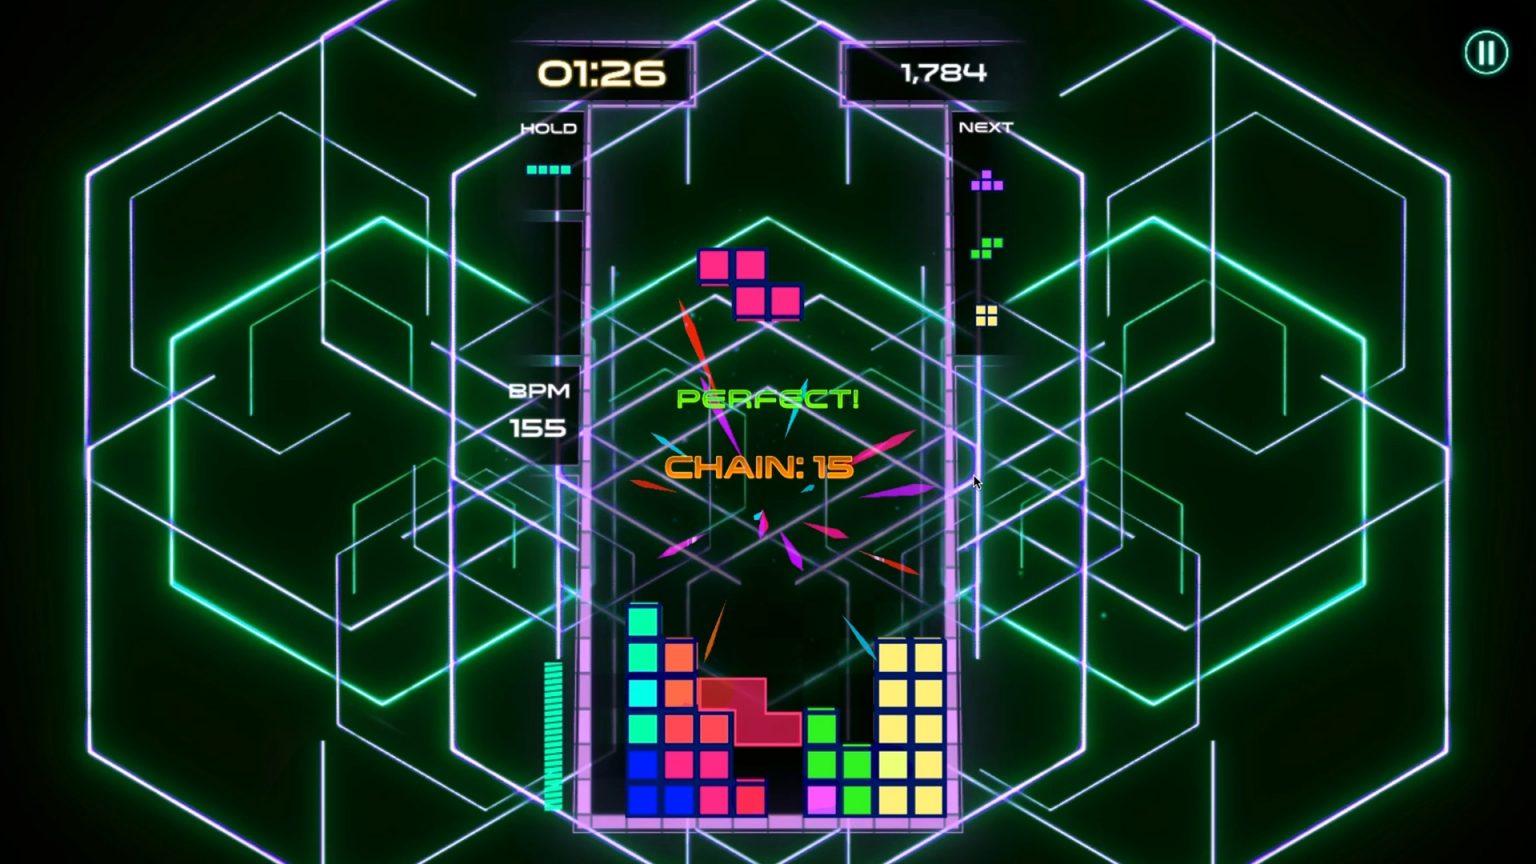 'Tetris Beat' is coming soon to Apple Arcade